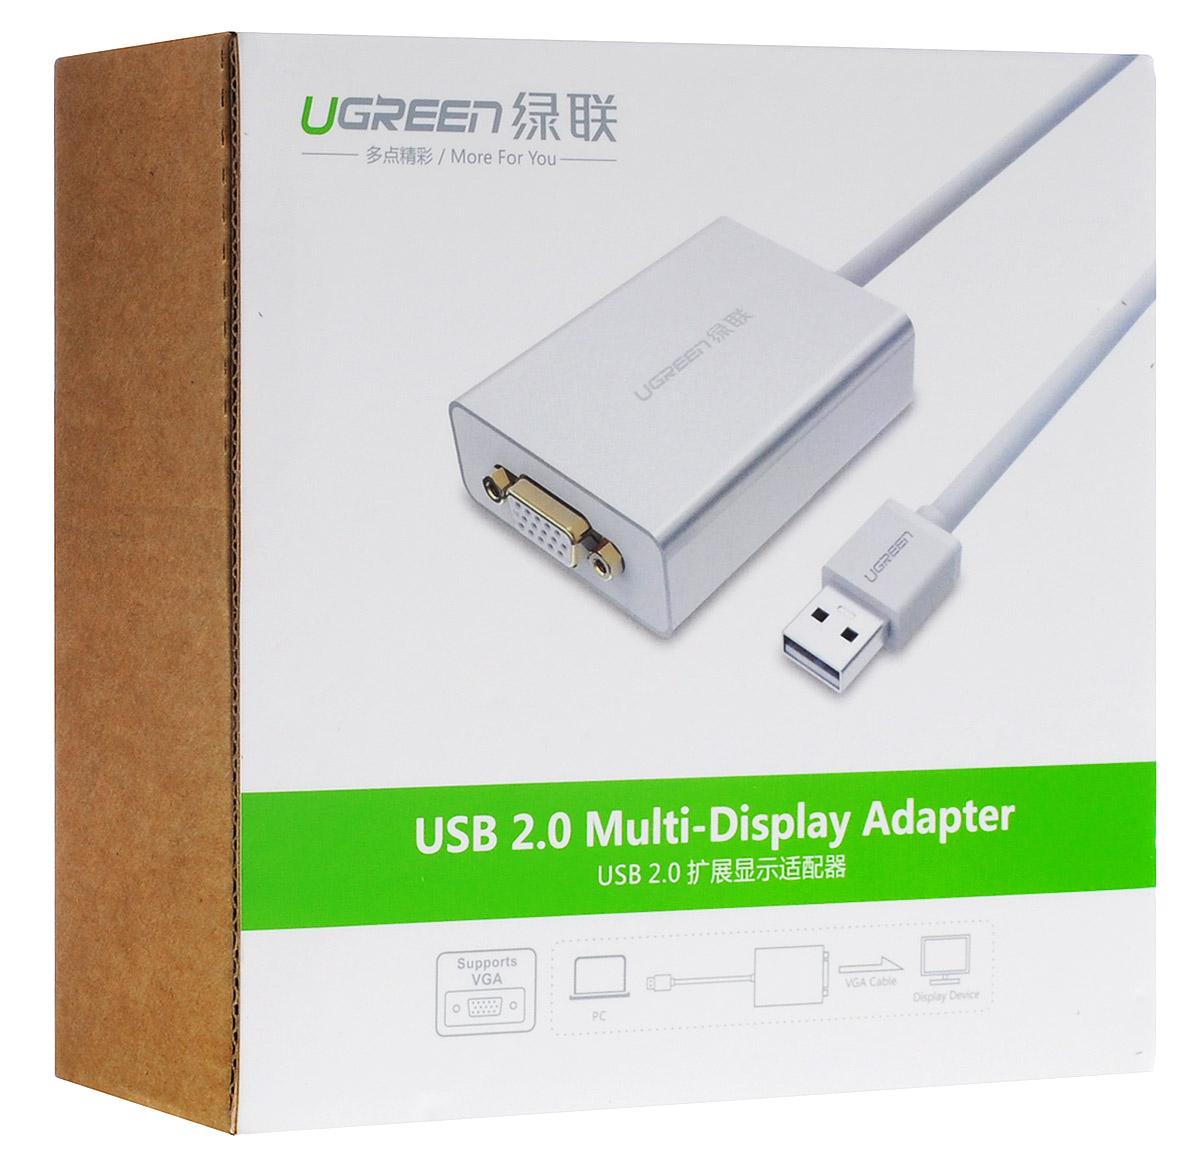 Ugreen UG-40244, White Silver конвертер-переходник USB/VGA